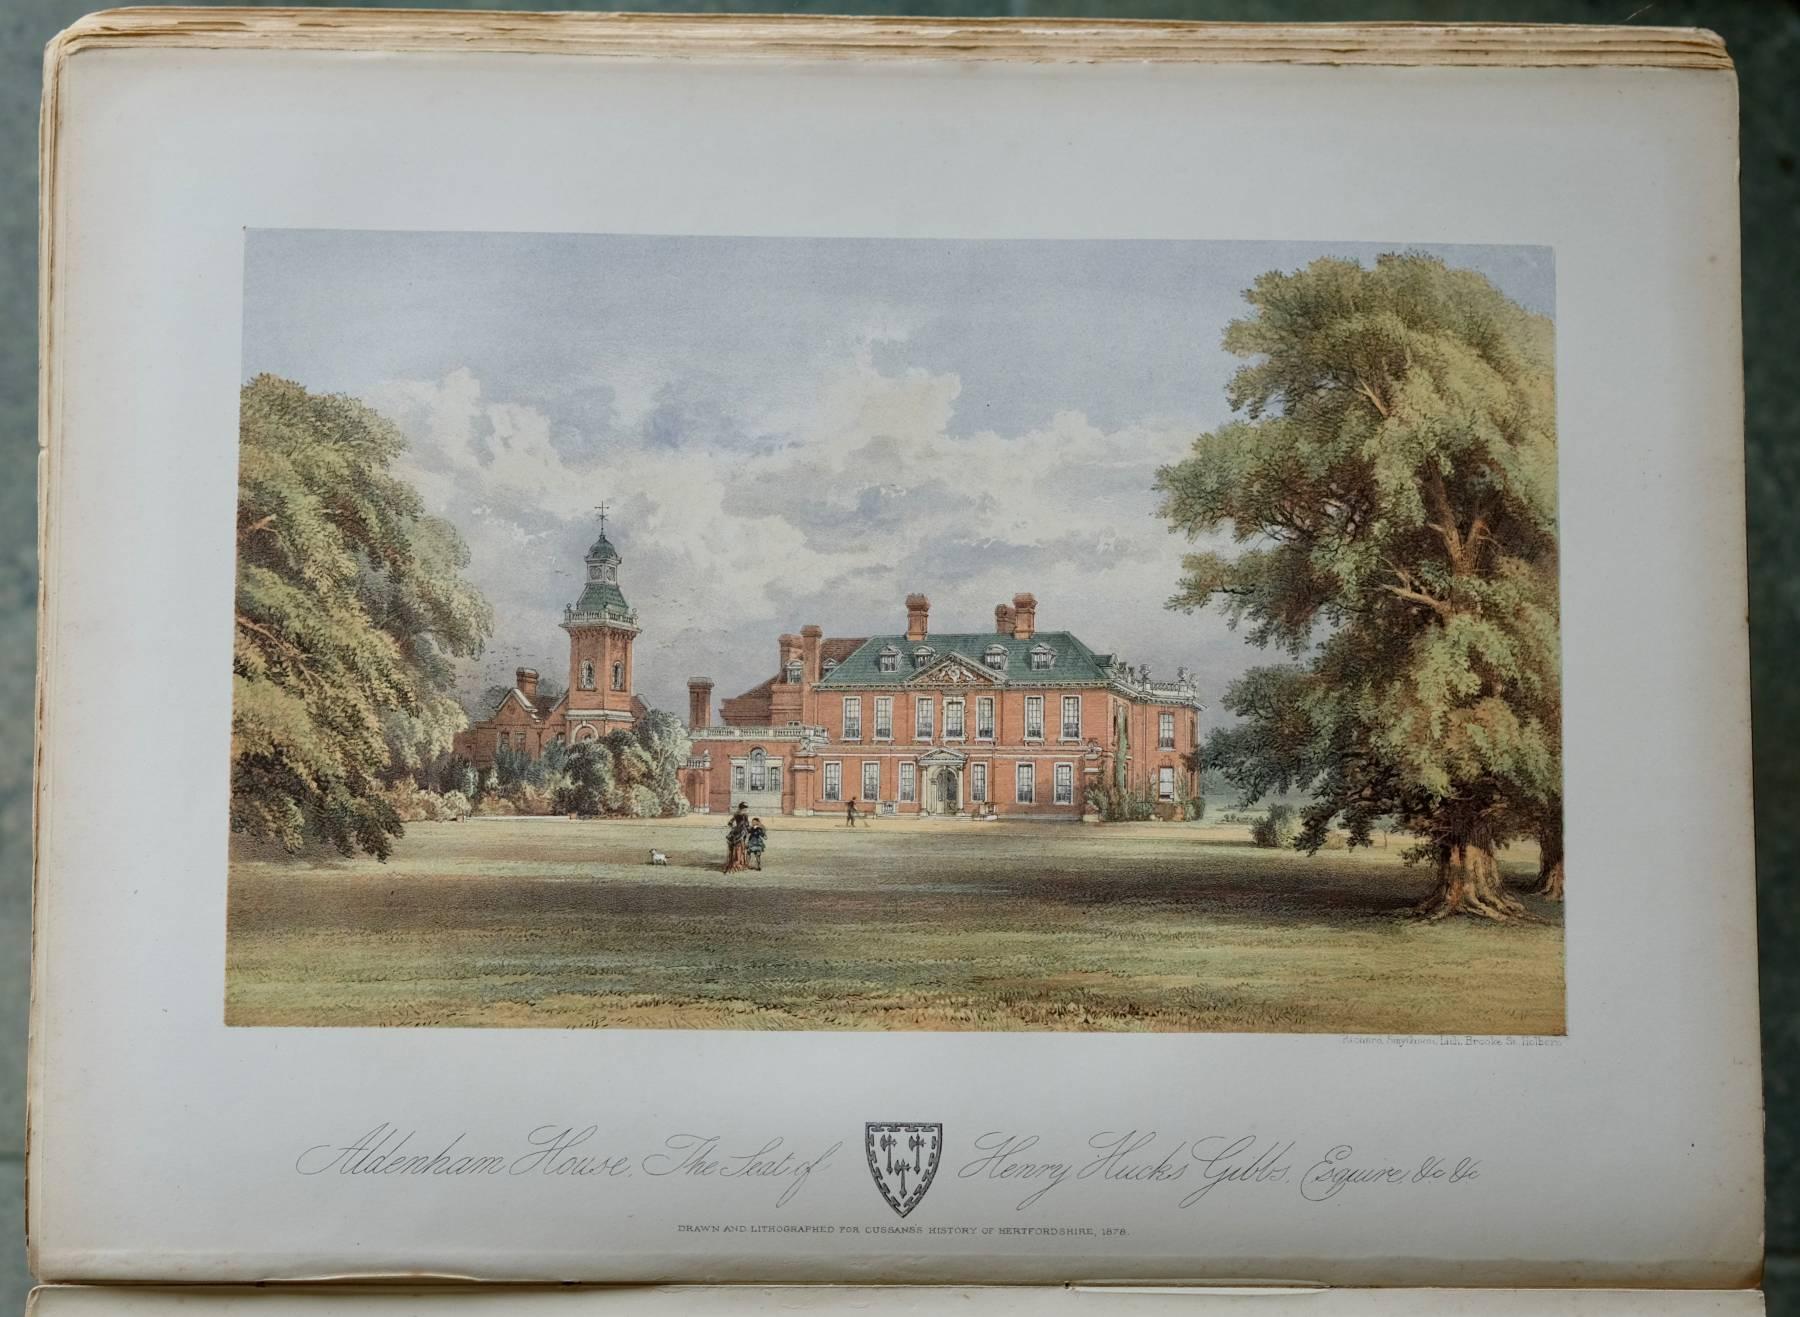 History of Hertfordshire Dacorum Hundred